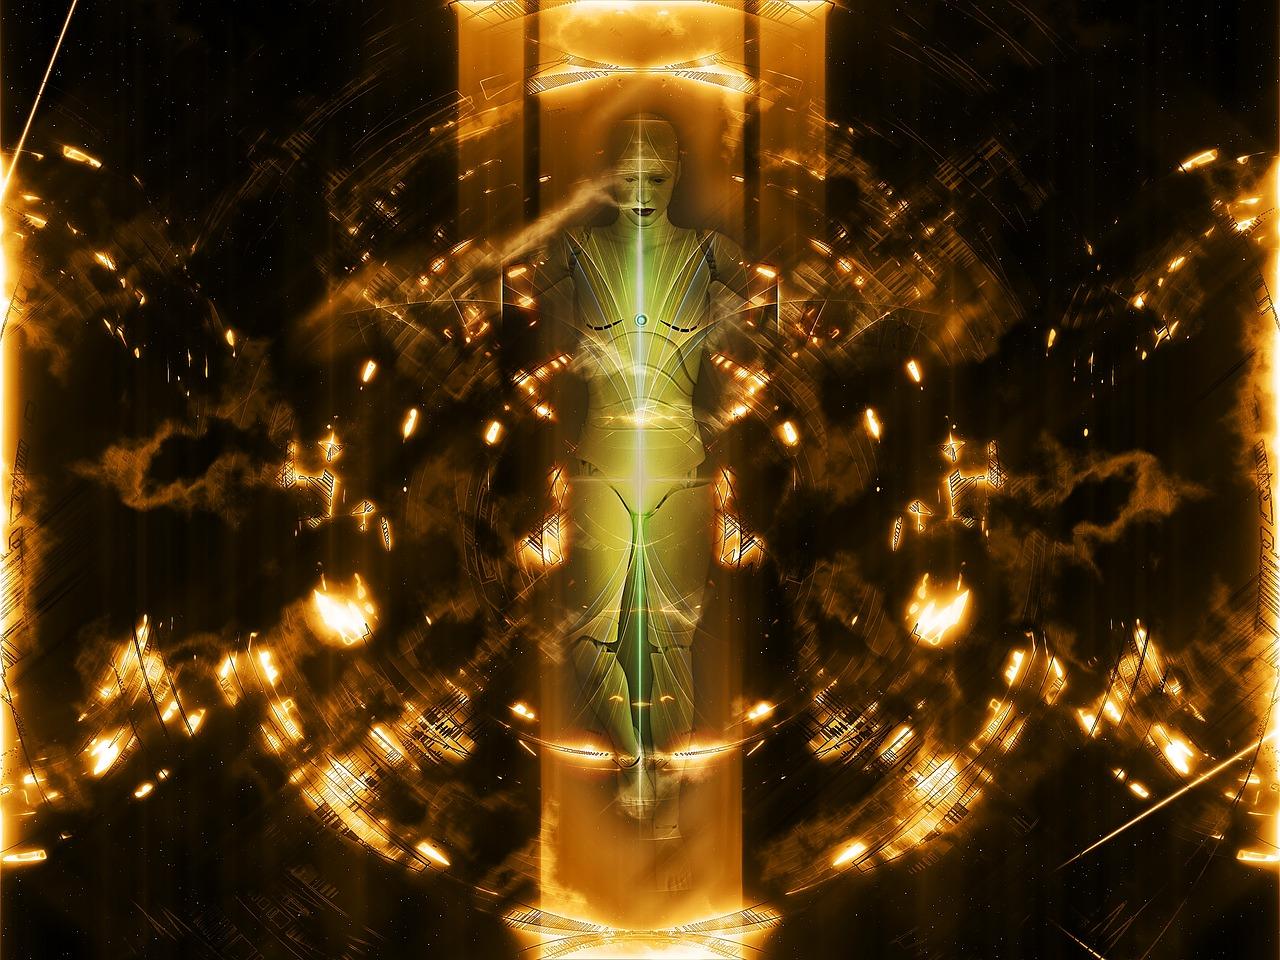 science-fiction-1758381_1280.jpg